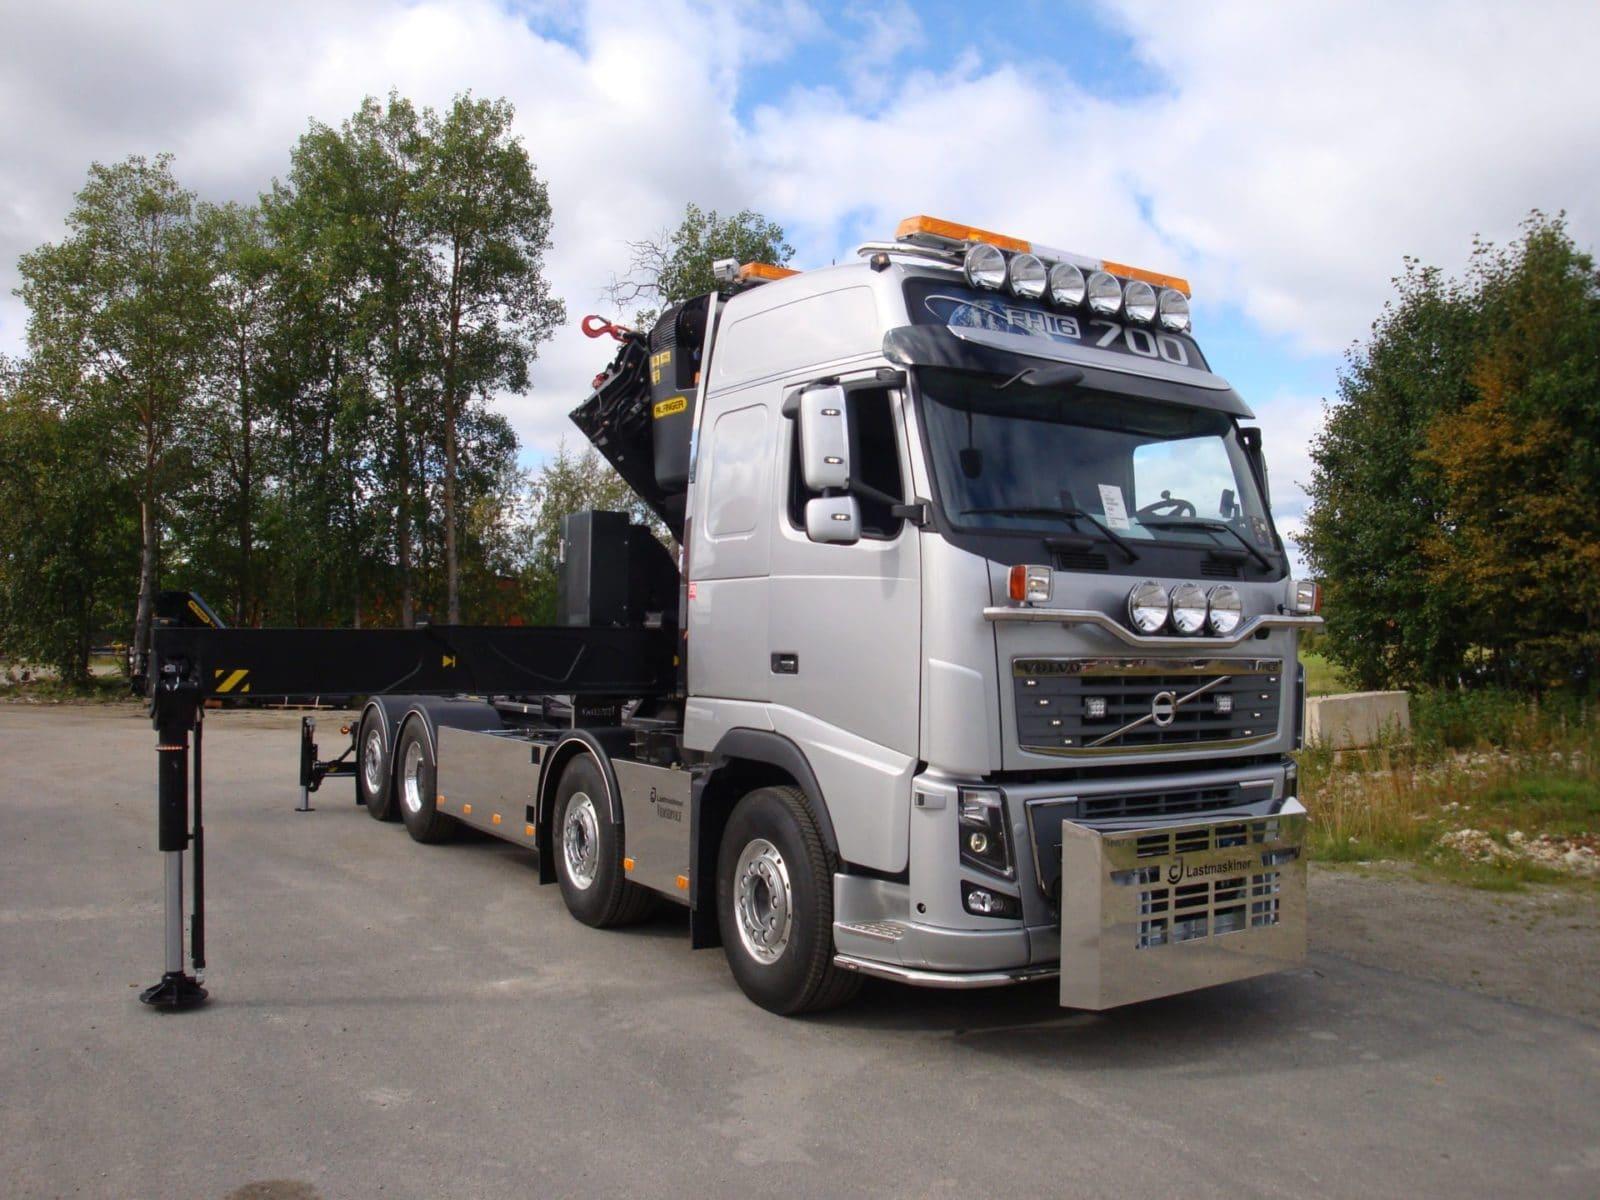 1023315-cj-lastmaskiner-23